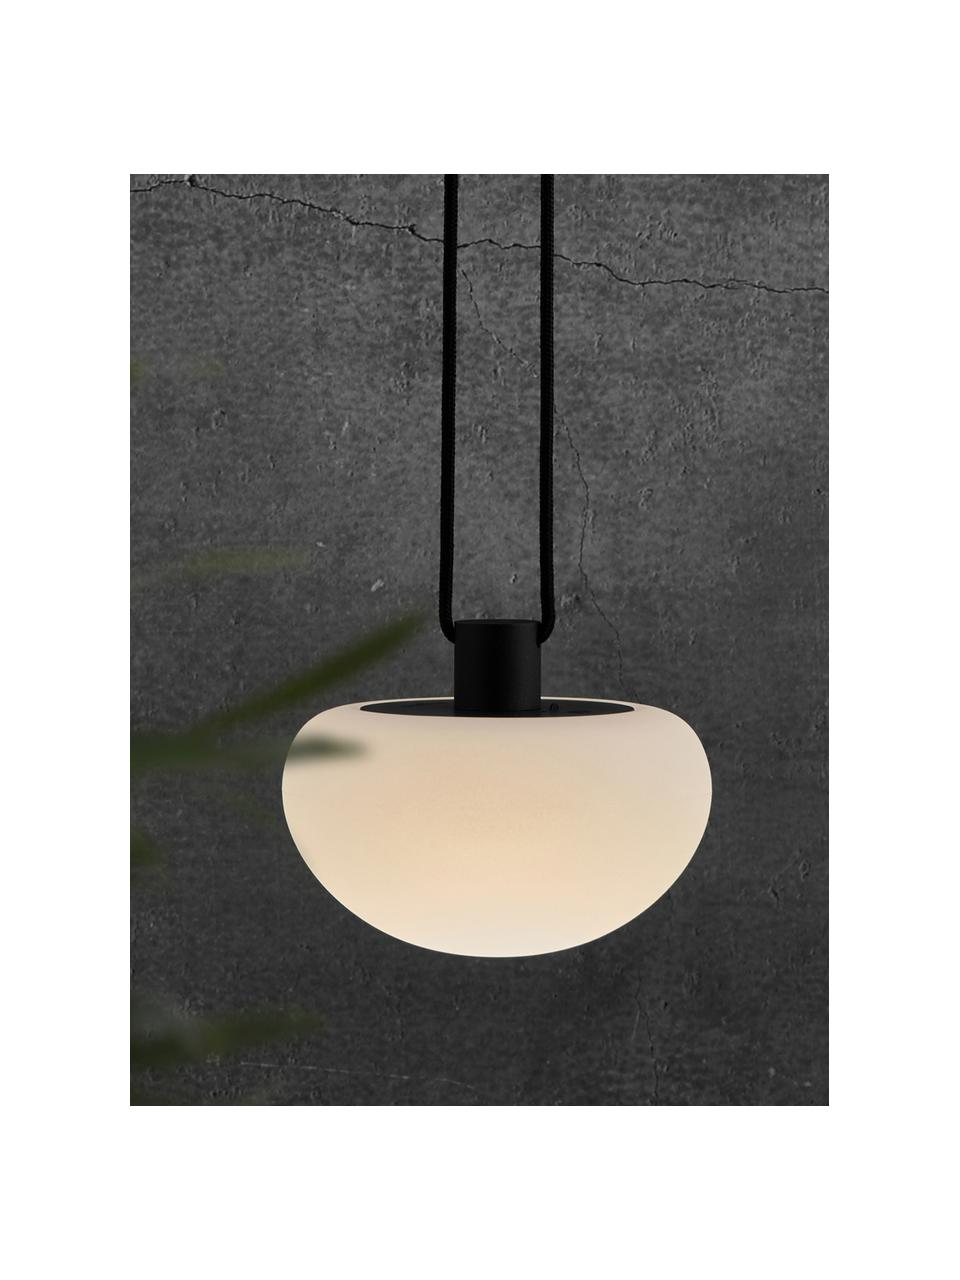 Mobile Dimmbare Hängelampe Sponge, Lampenschirm: Kunststoff, Weiß, Schwarz, Ø 20 x H 16 cm